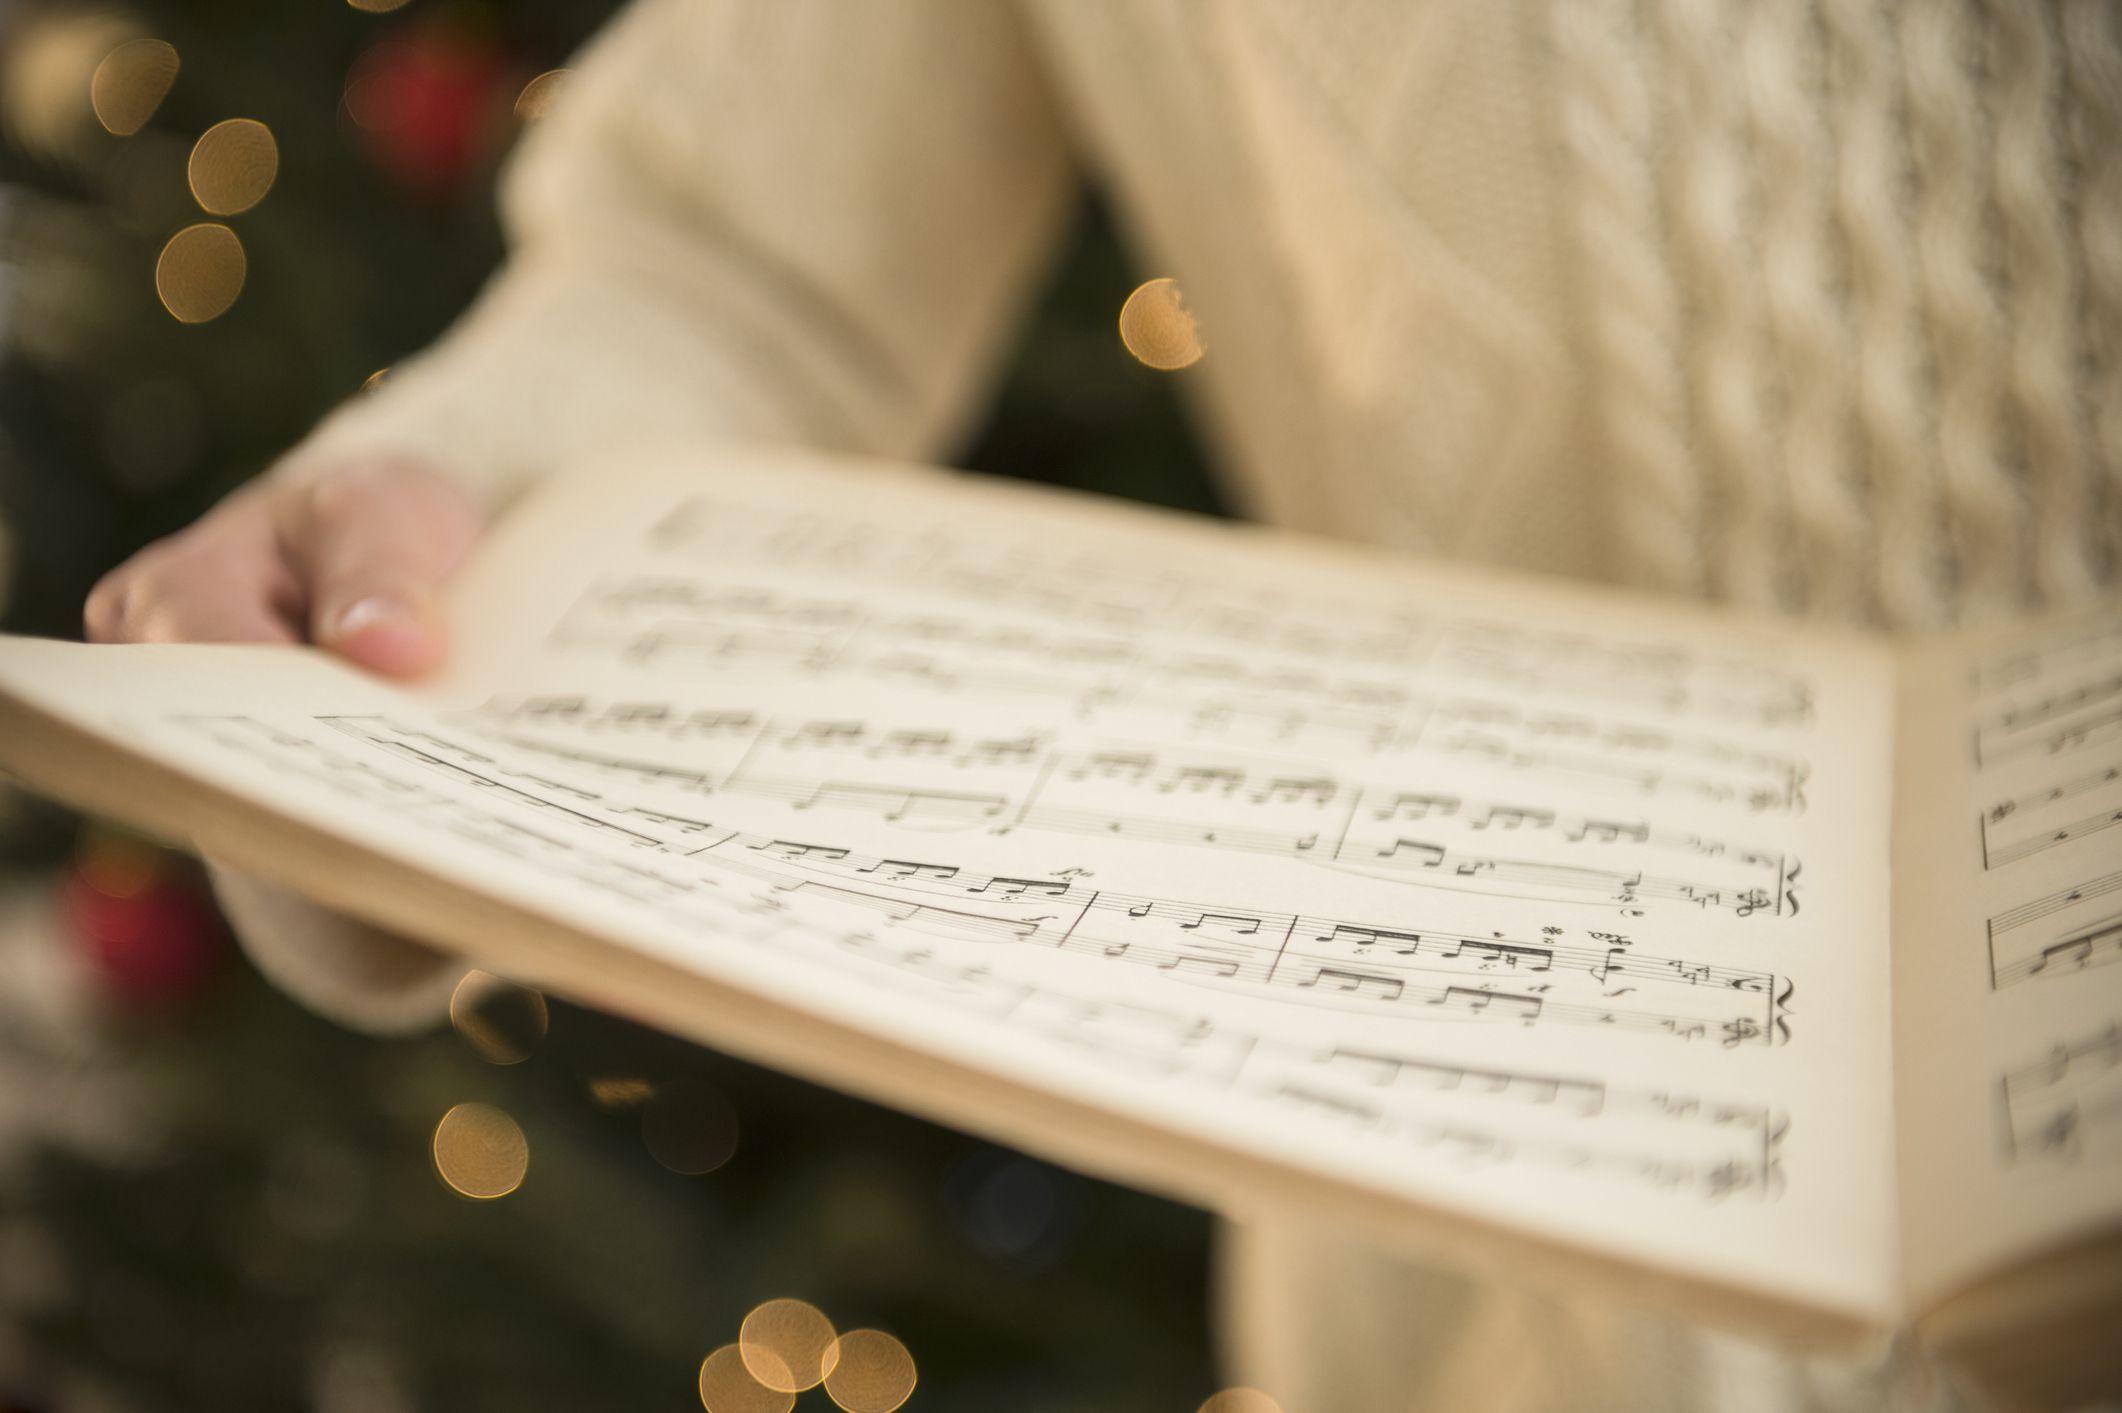 O Come All Ye Faithful Chords